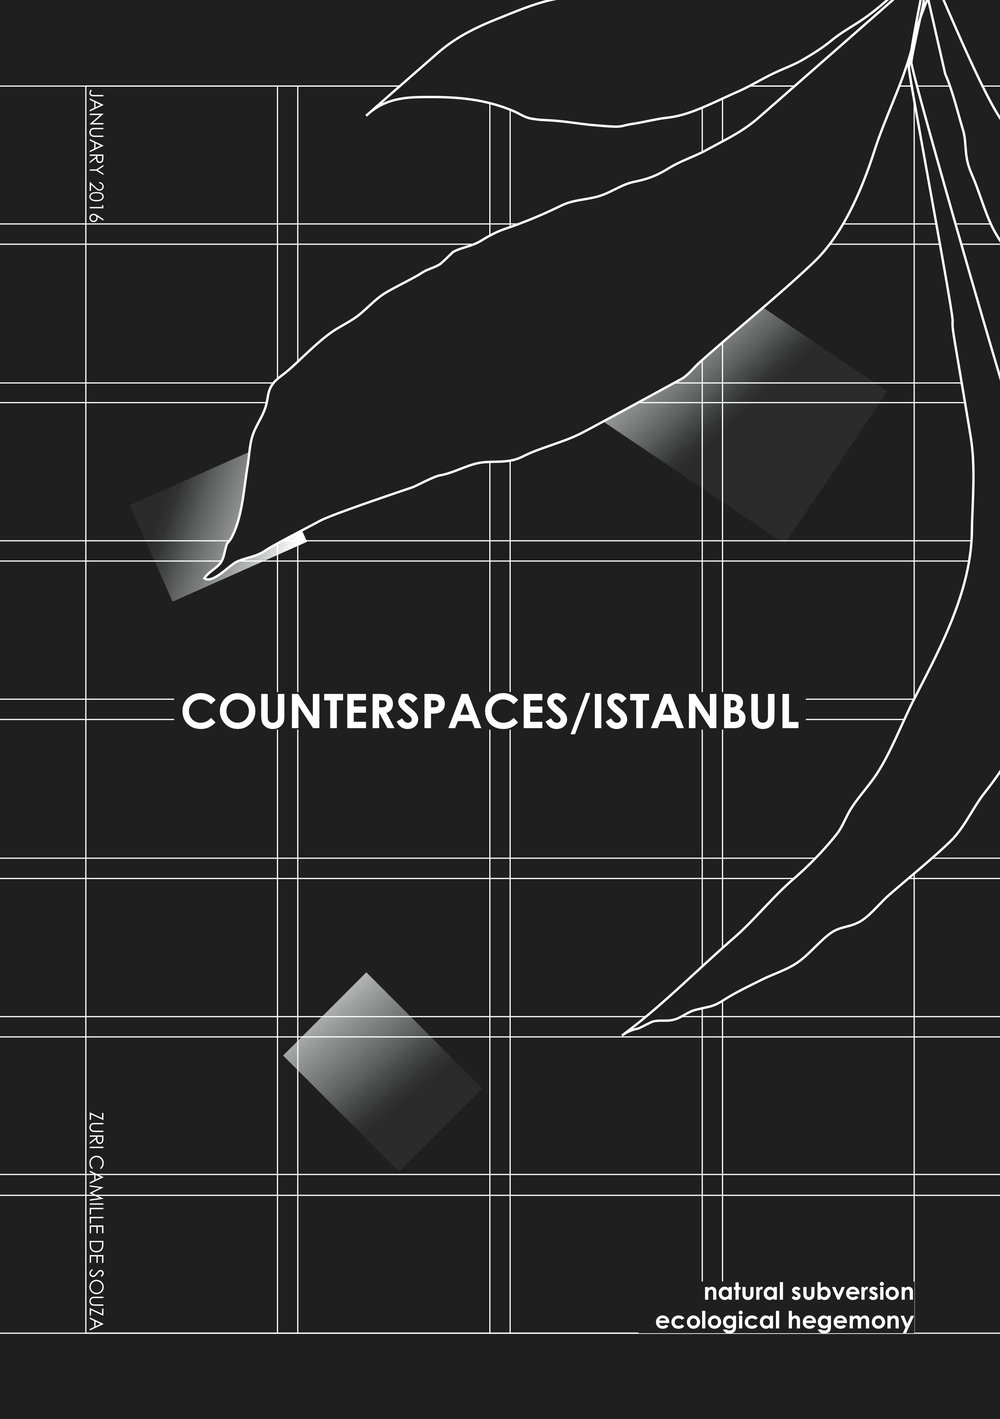 Zuri Camille De Souza Counterspaces